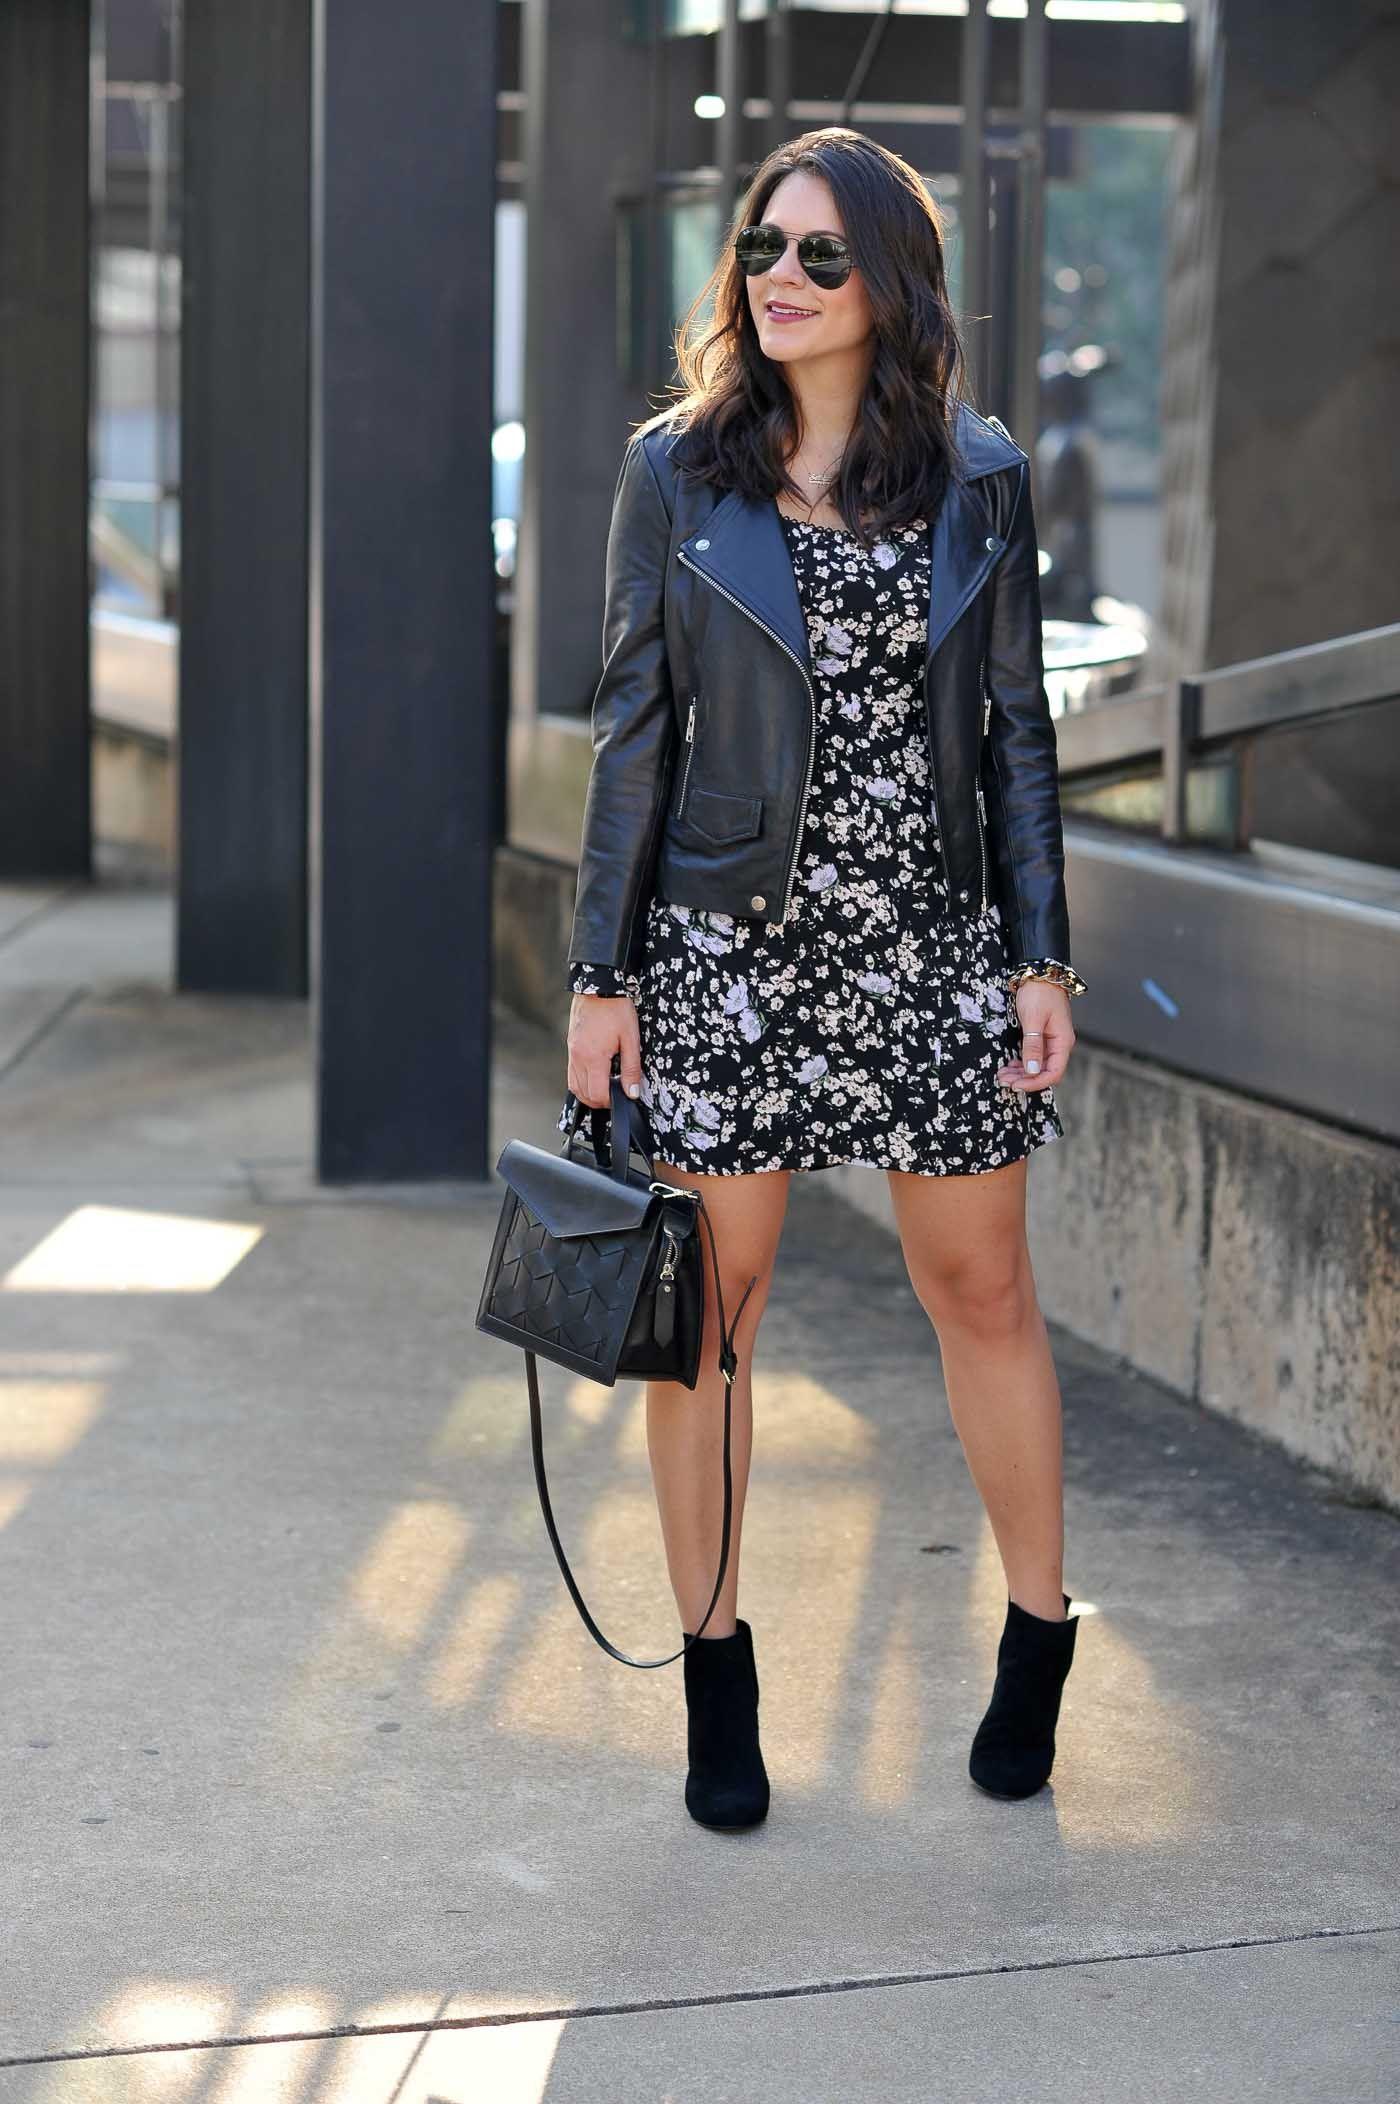 d4b18bce068 Black floral print dress+black heeled ankle boots+black motor leather  jacket+black shoulder bag+aviator sunglasses. Fall Dressy Casual  Evening  Party  ...